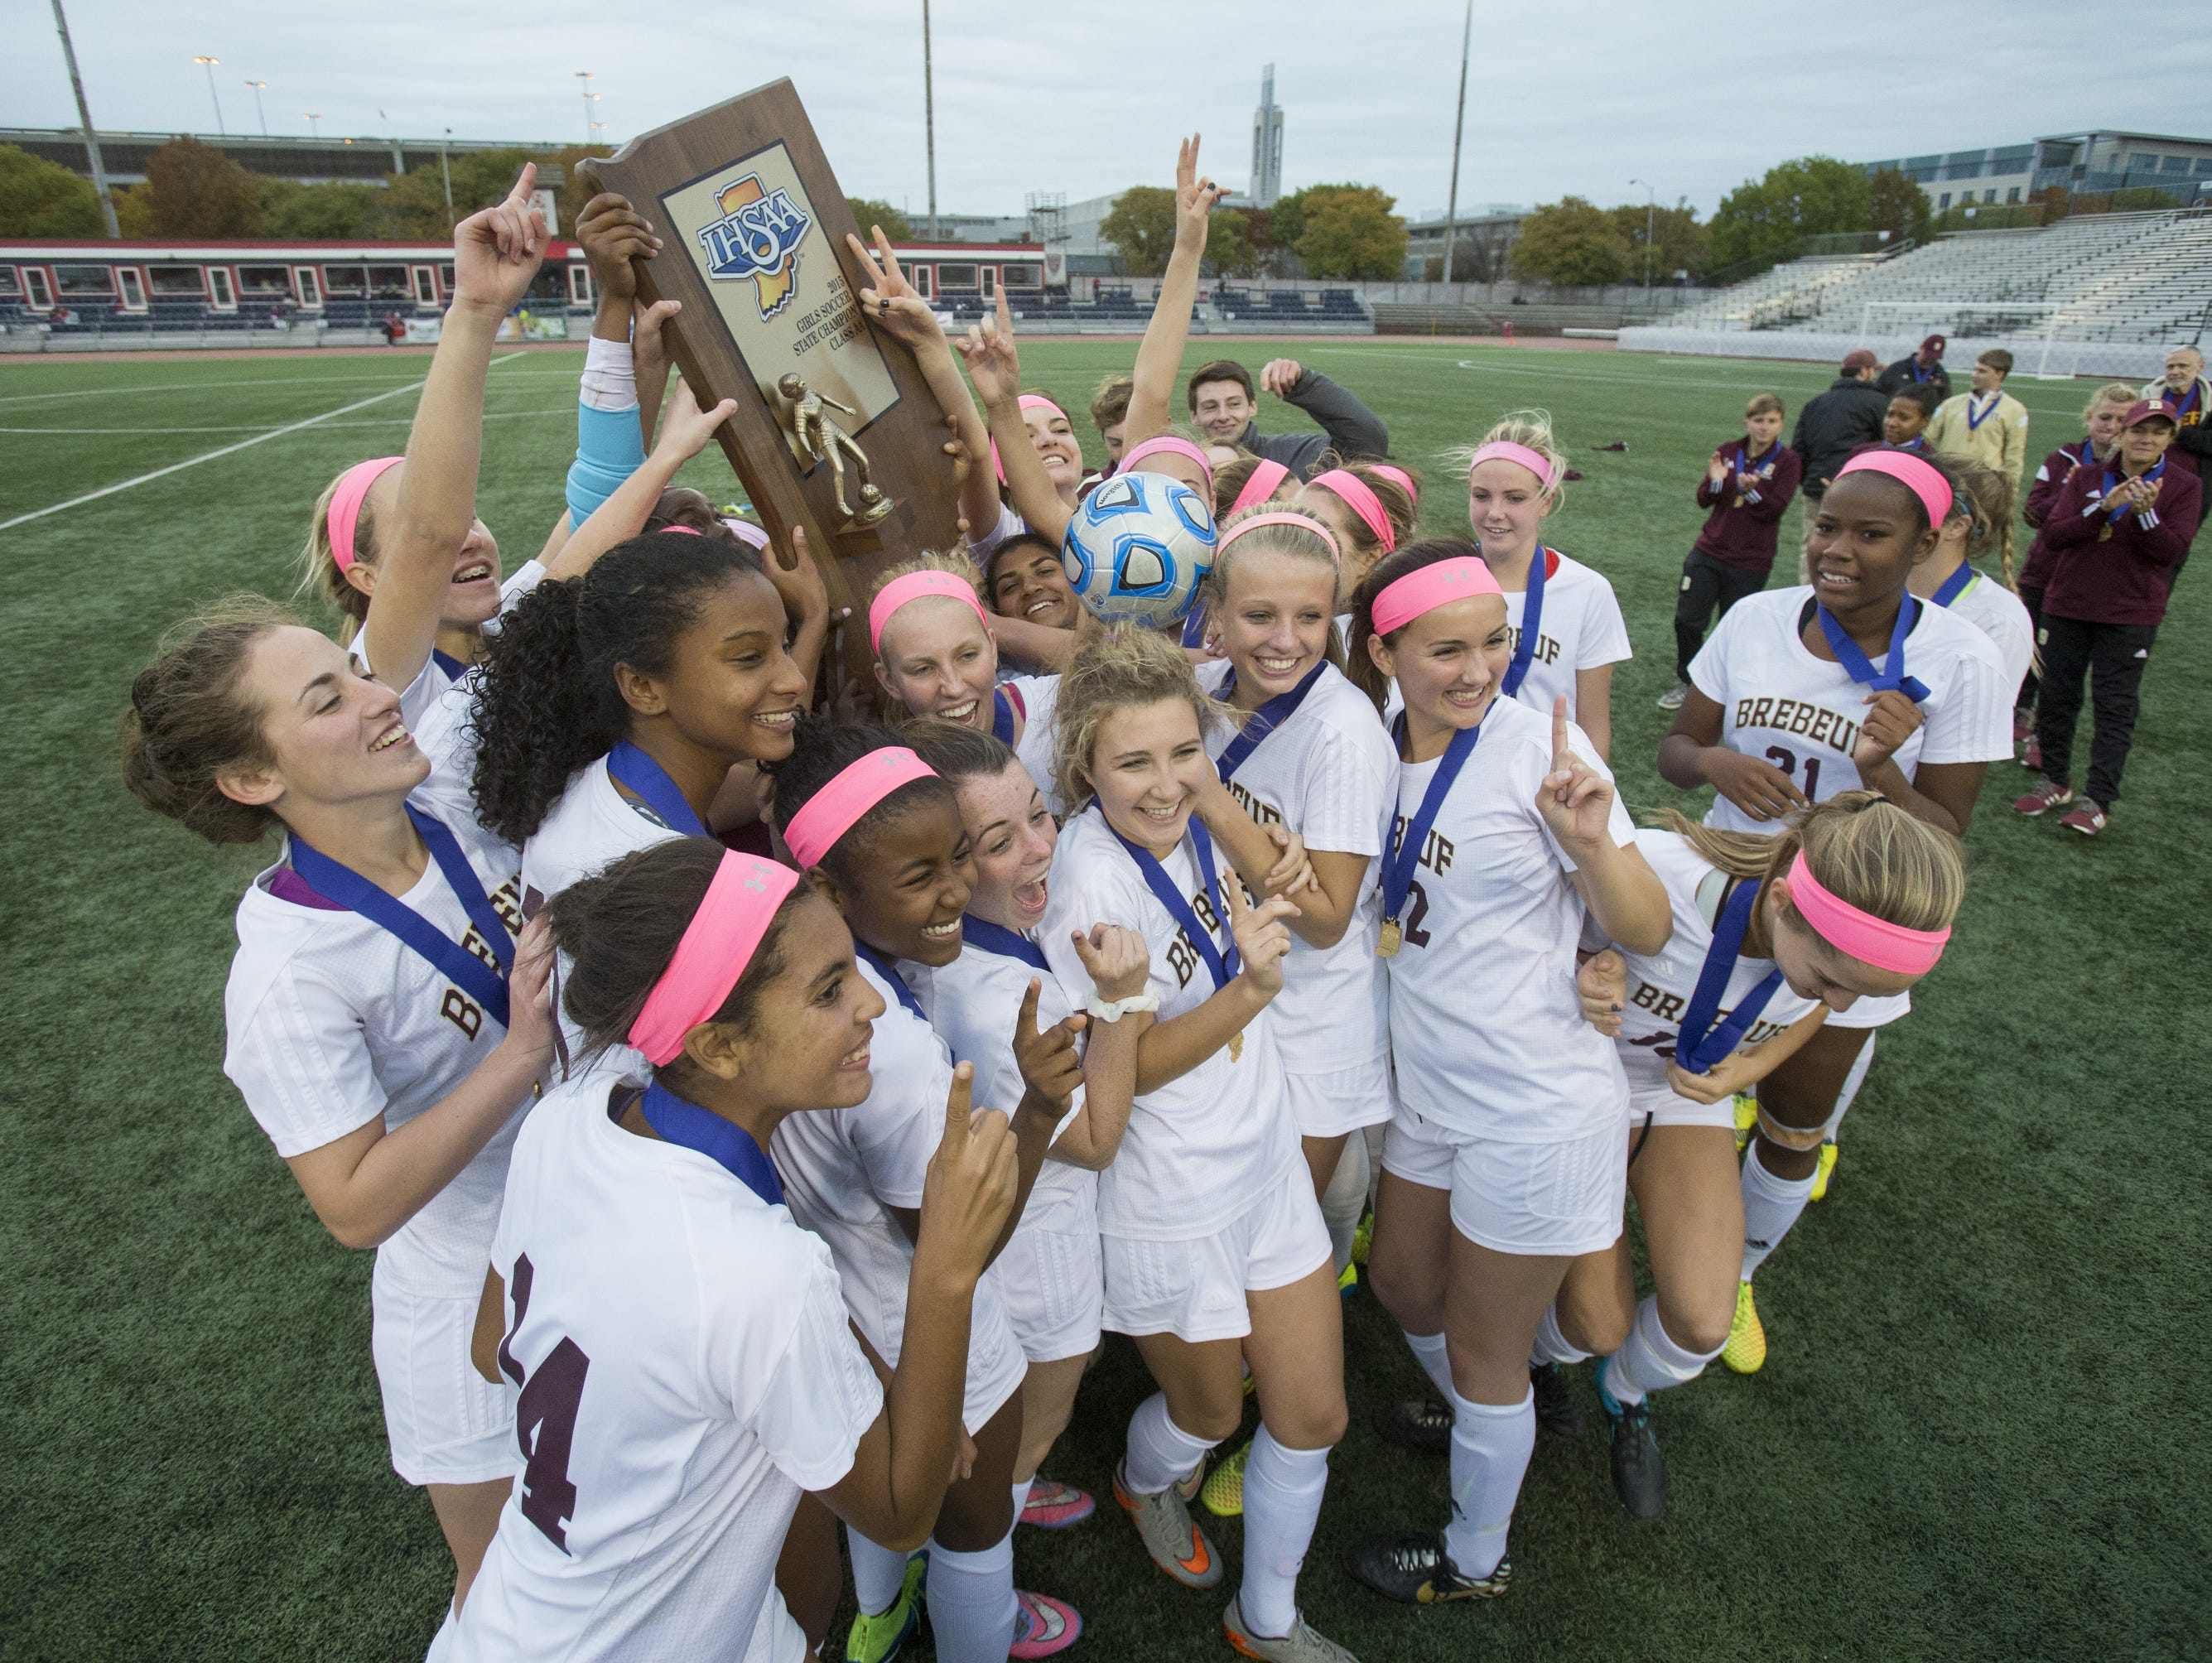 Brebeuf Jesuit High School celebrates their win, IHSAA Girls Class 2A State Soccer Finals, Michael A. Carroll Track & Soccer Stadium, IUPUI, Indianapolis, Saturday, Oct. 31, 2015. Brebeuf Jesuit beat Penn High School, 2-1.